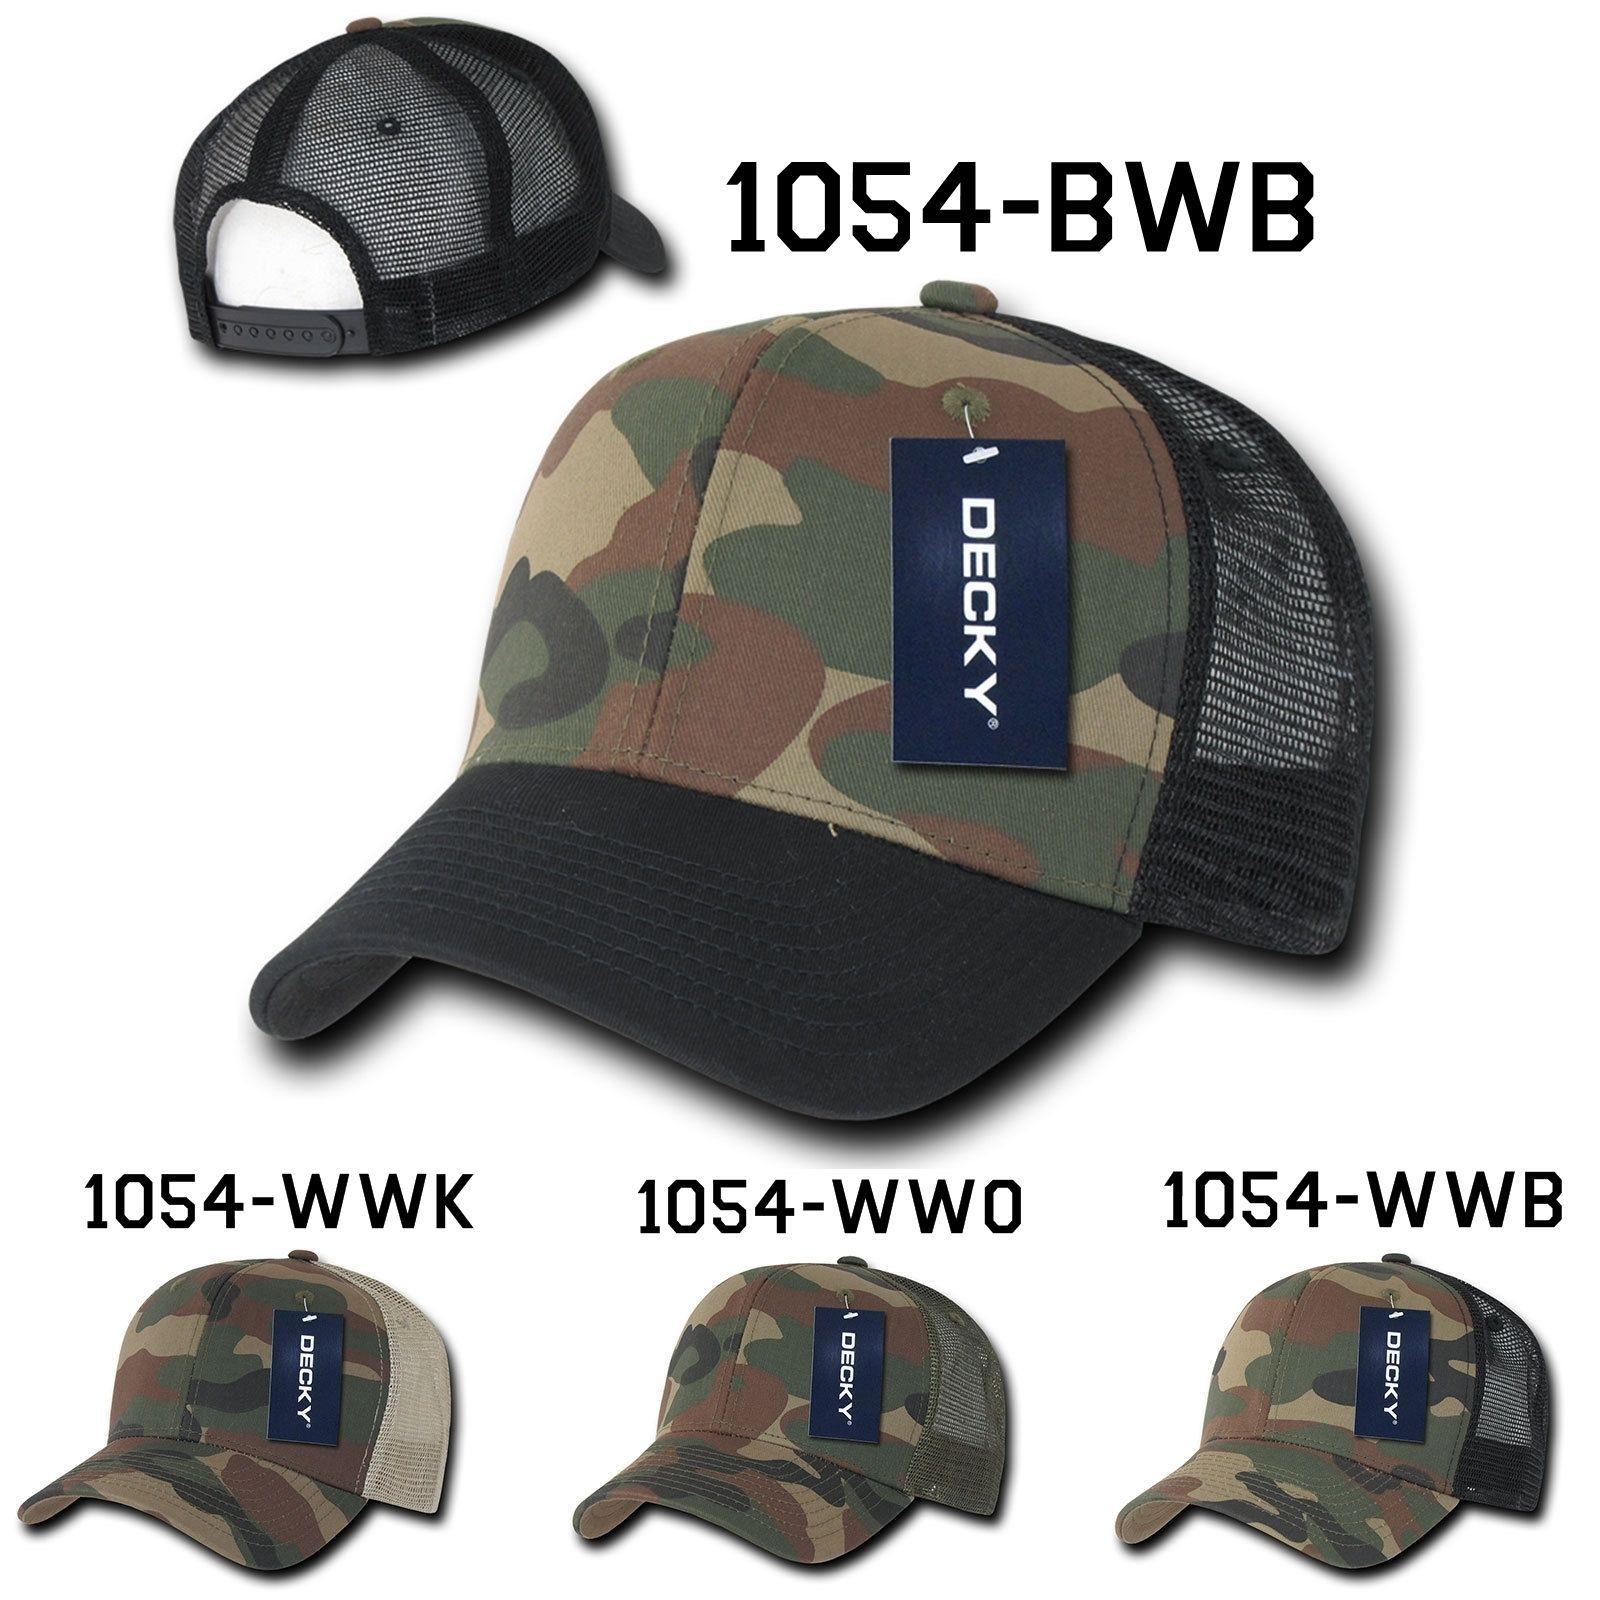 CUSTOM EMBROIDERY Personalized Customized Decky Camo Trucker Snapback Cap 1054